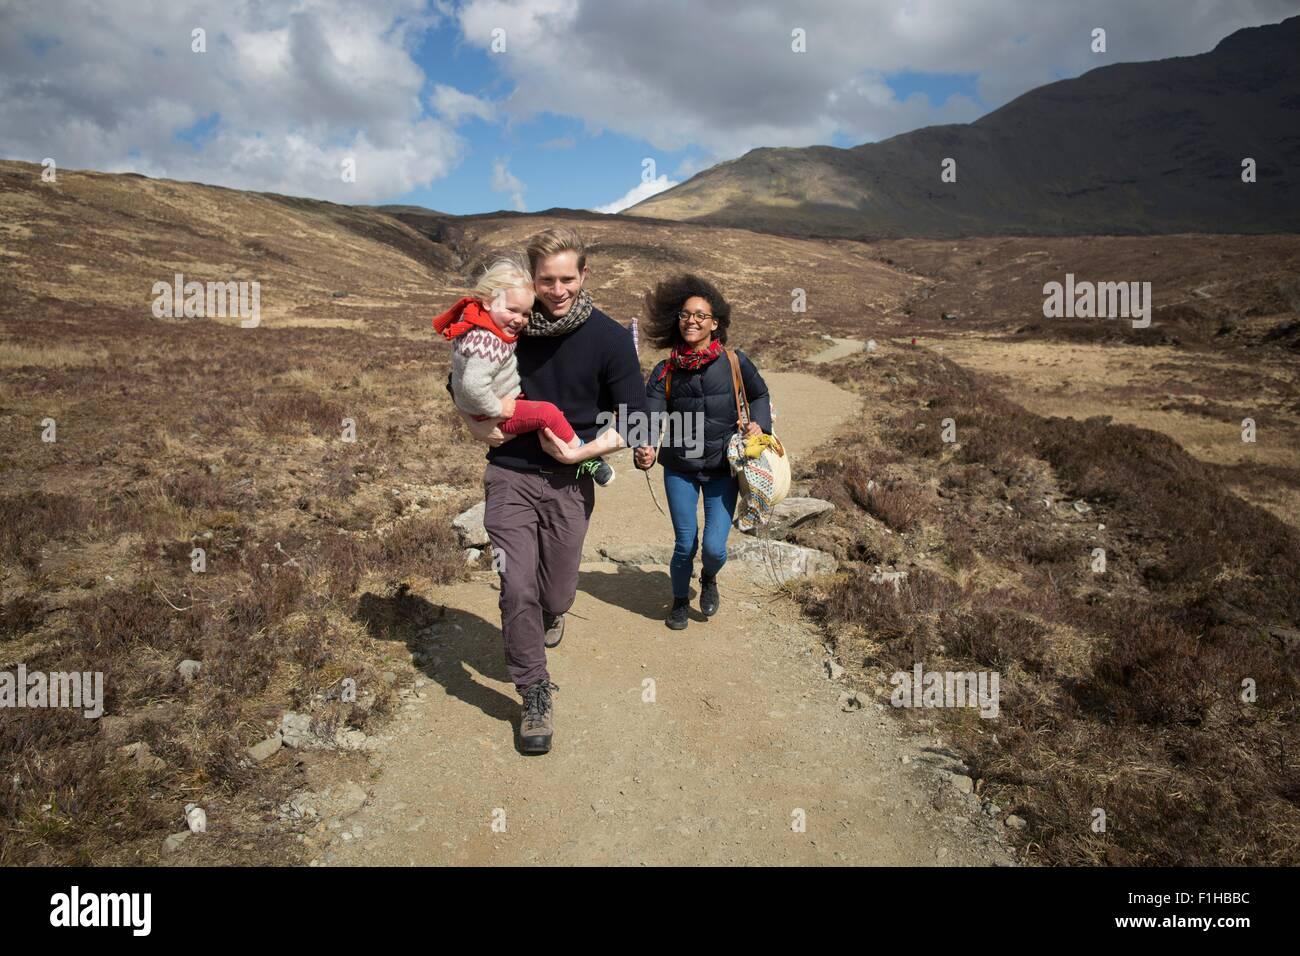 Family out hiking, Fairy Pools, Isle of Skye, Hebrides, Scotland - Stock Image